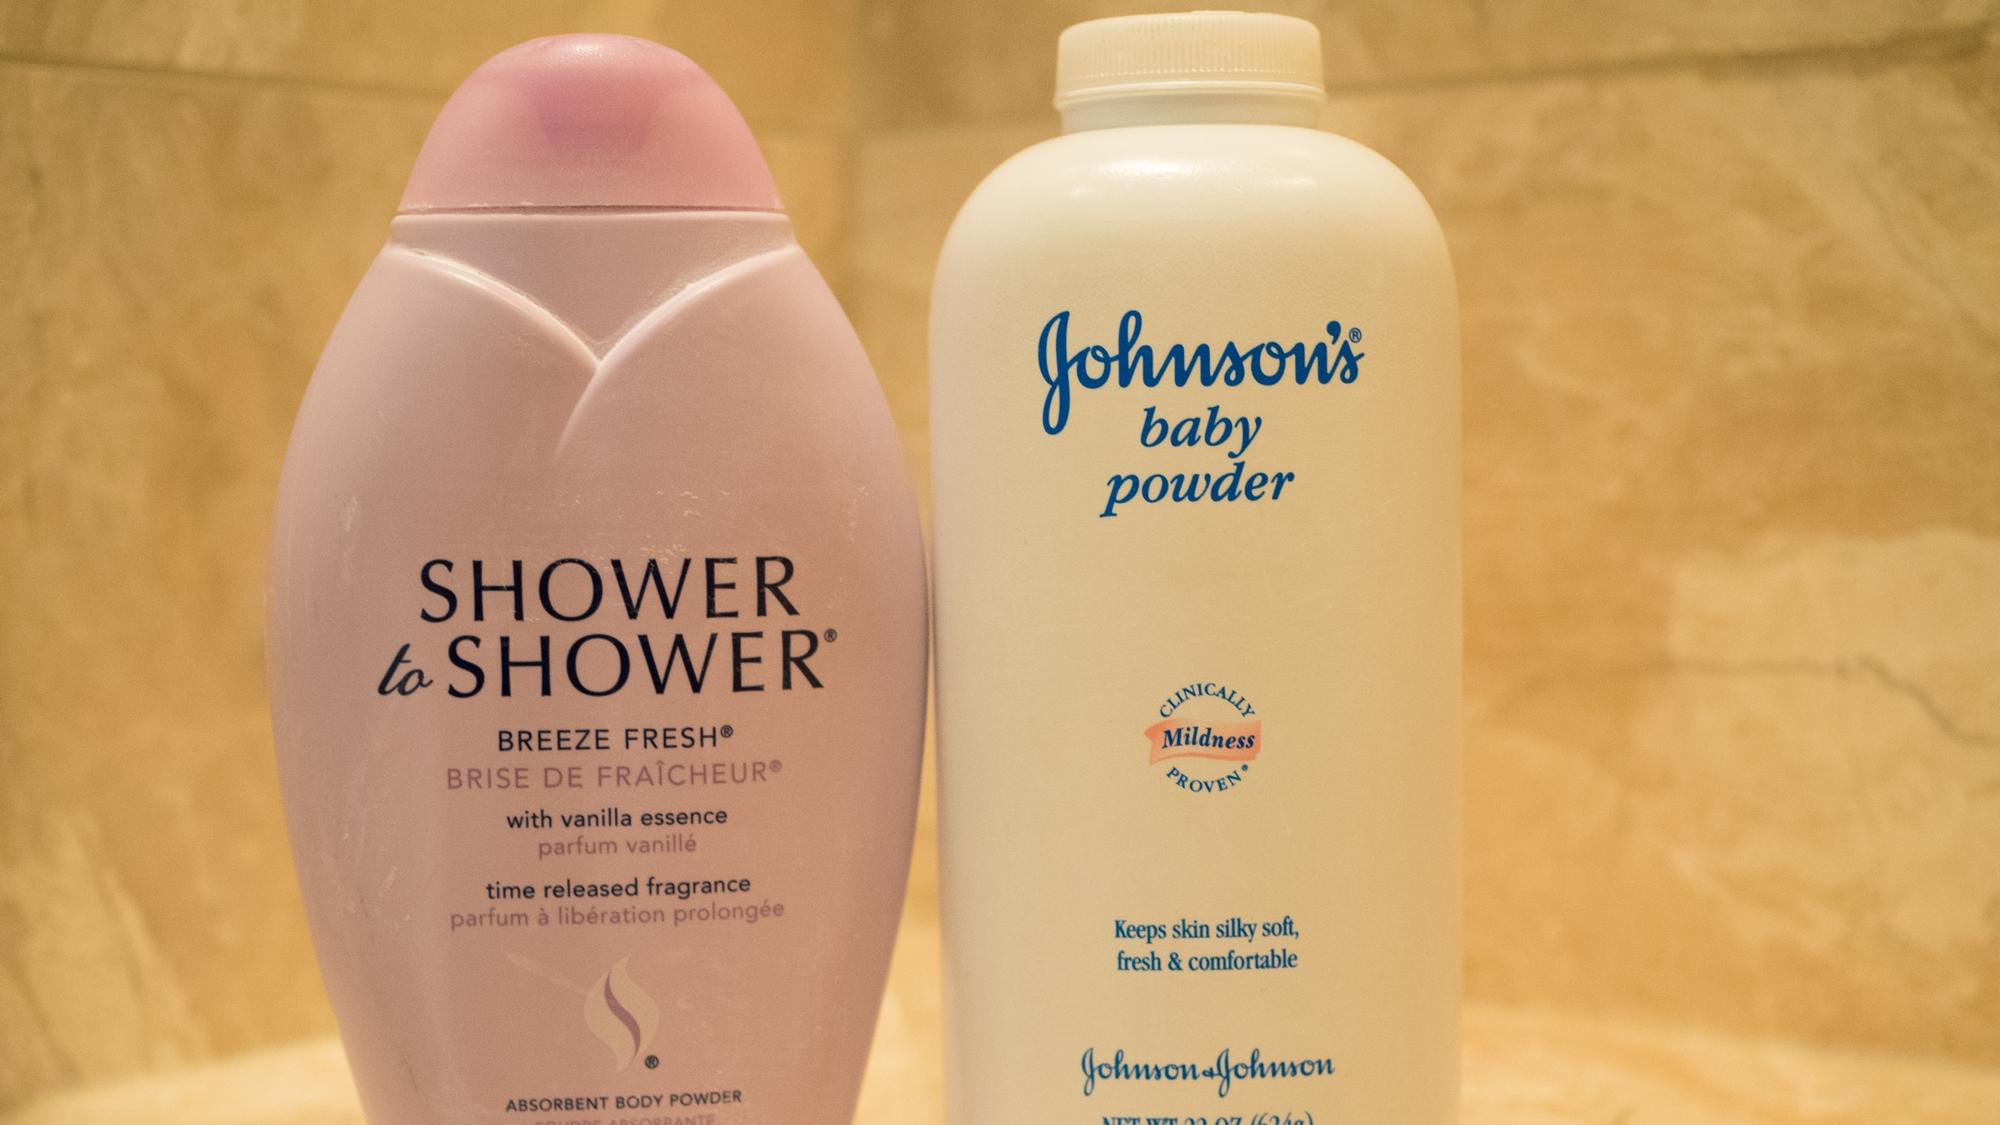 Talco de Johnson & Johnson puede causar cáncer a tu bebé: Reuters